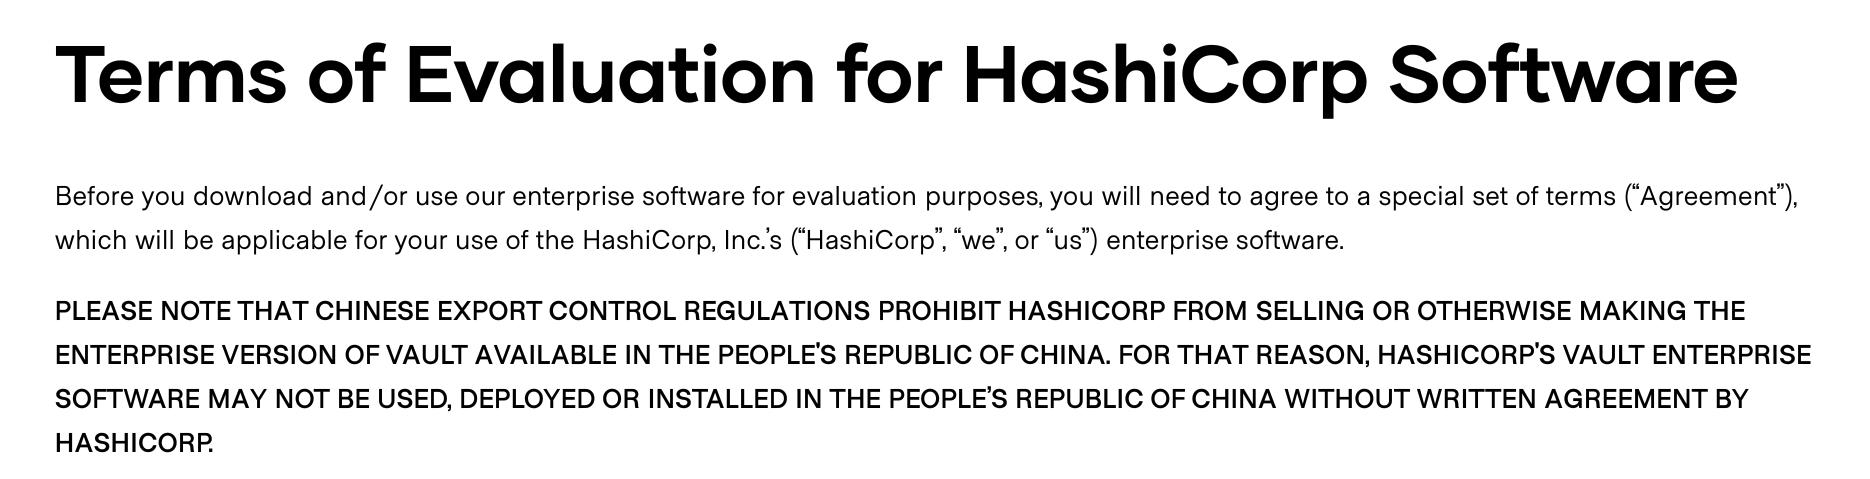 HashiCorp 产品禁止中国公司使用,引发对开源软件受限制的担忧